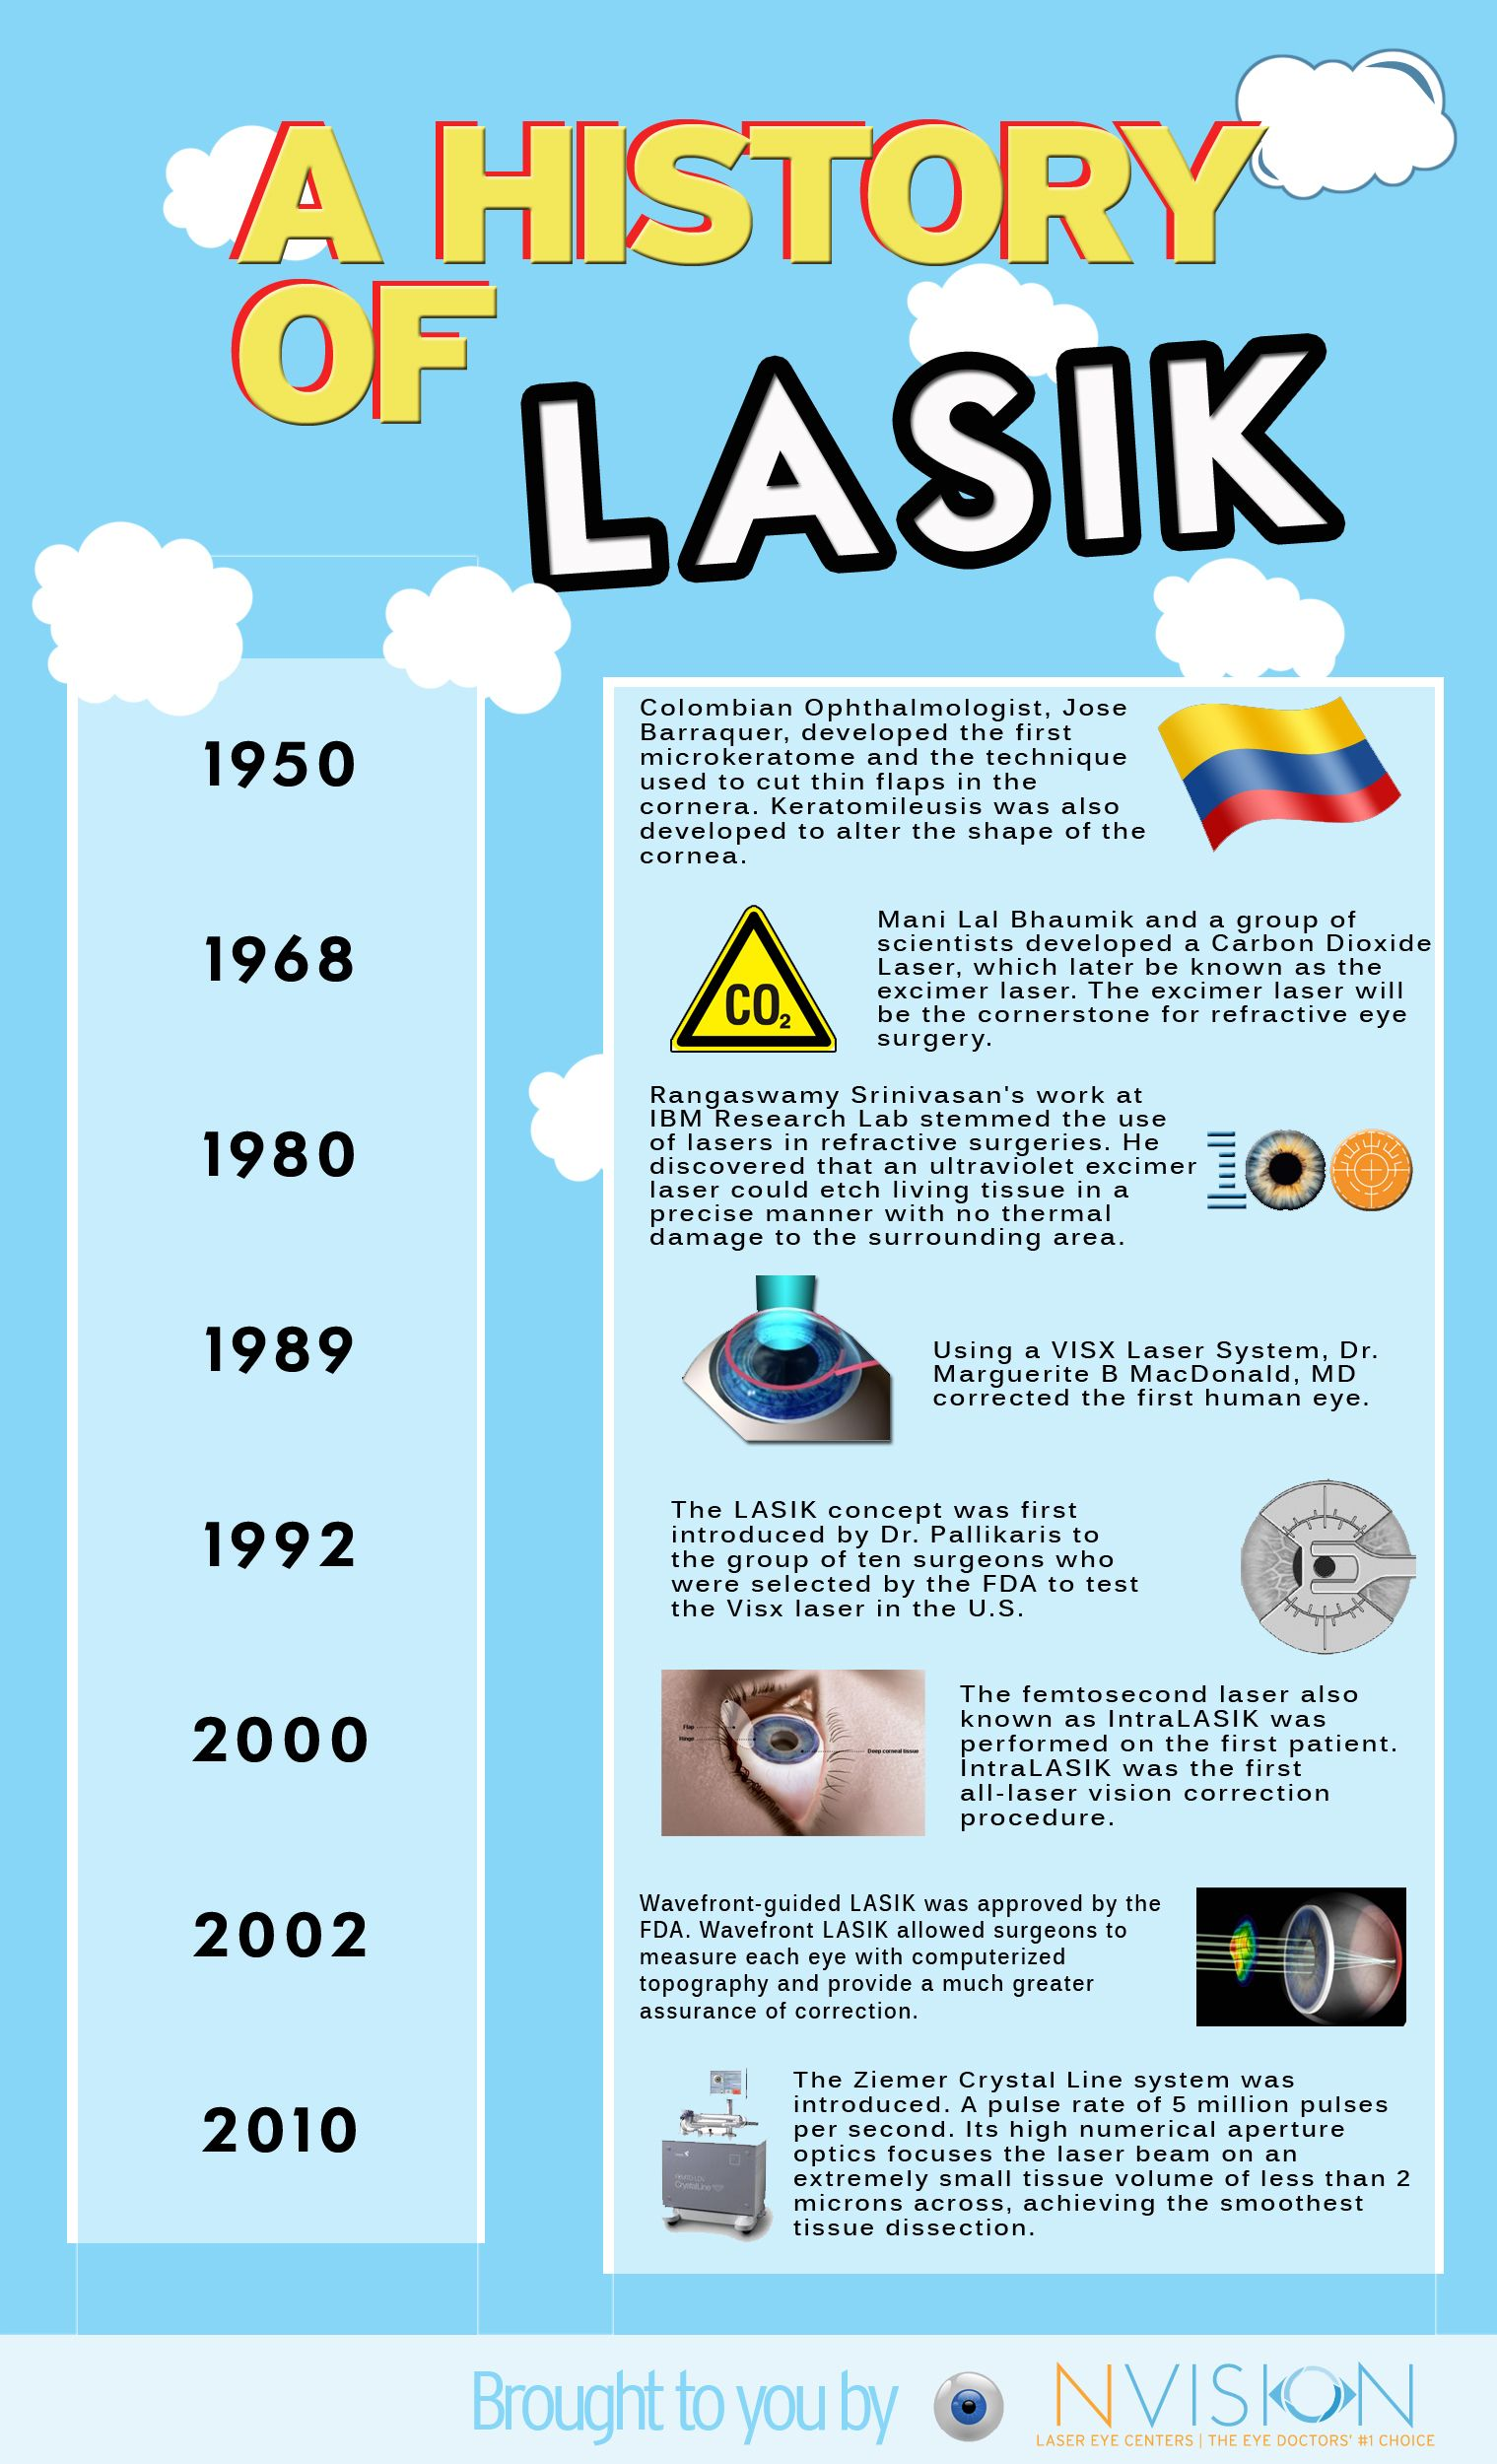 A History Of Lasik Lasik Lasik Eye Surgery Lasik Surgery